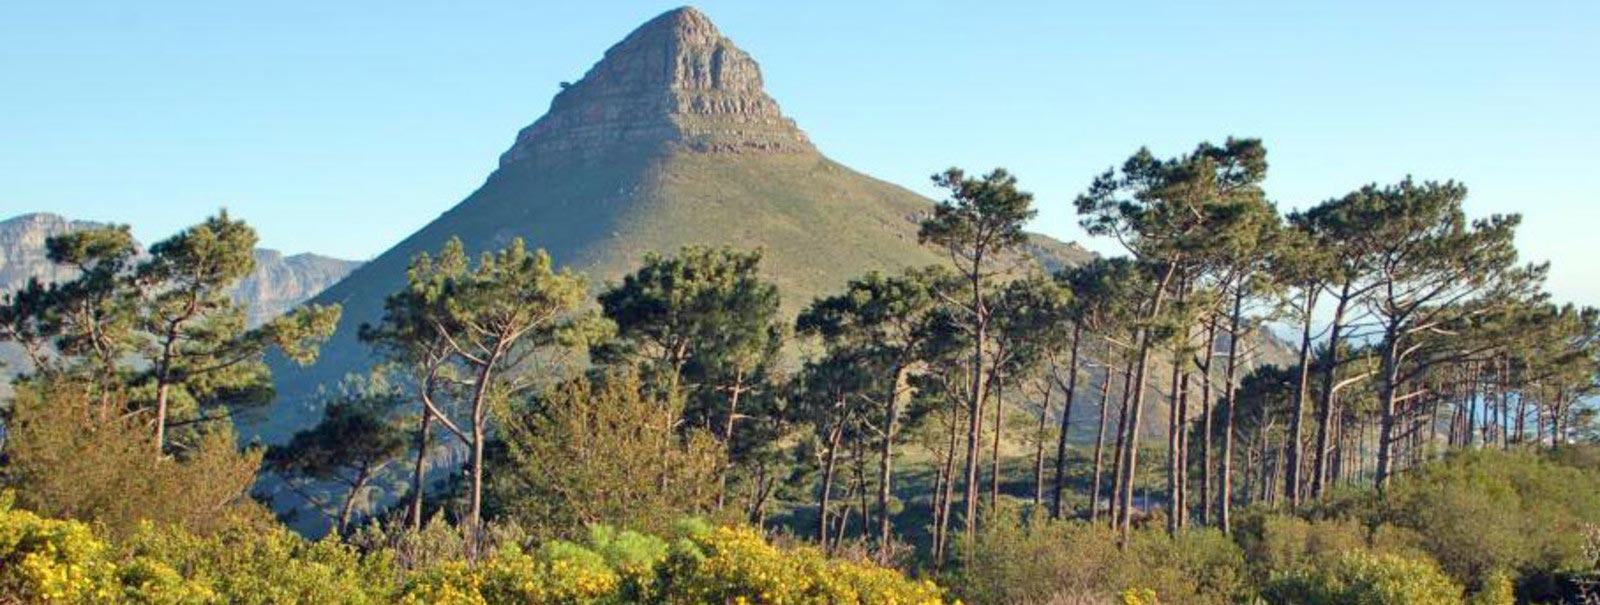 Paysage du Capt Vert - Panorama